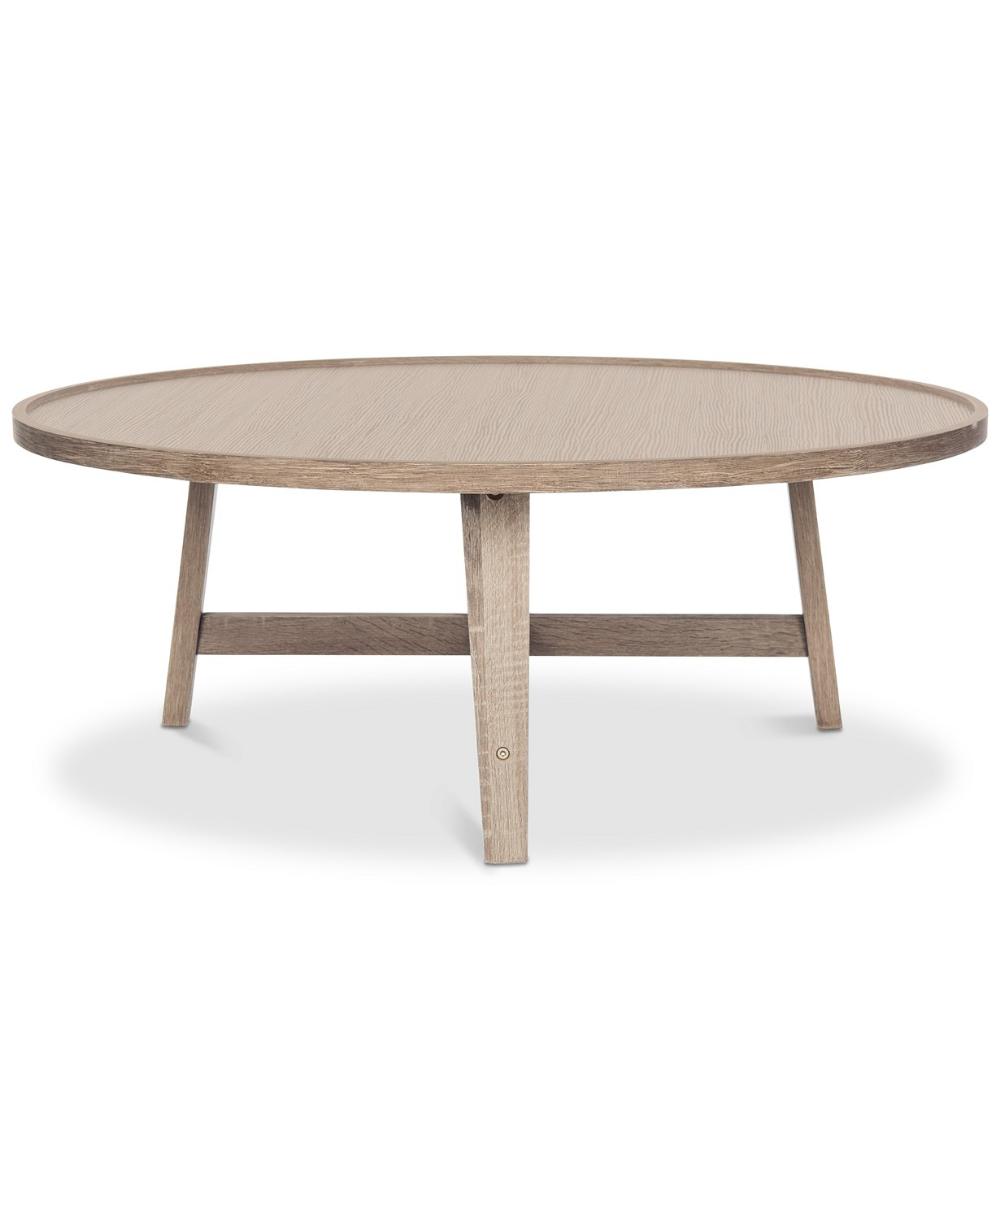 Safavieh Malone Wood Coffee Table Reviews Furniture Macy S Coffee Table Coffee Table Wood Furniture [ 1219 x 1000 Pixel ]